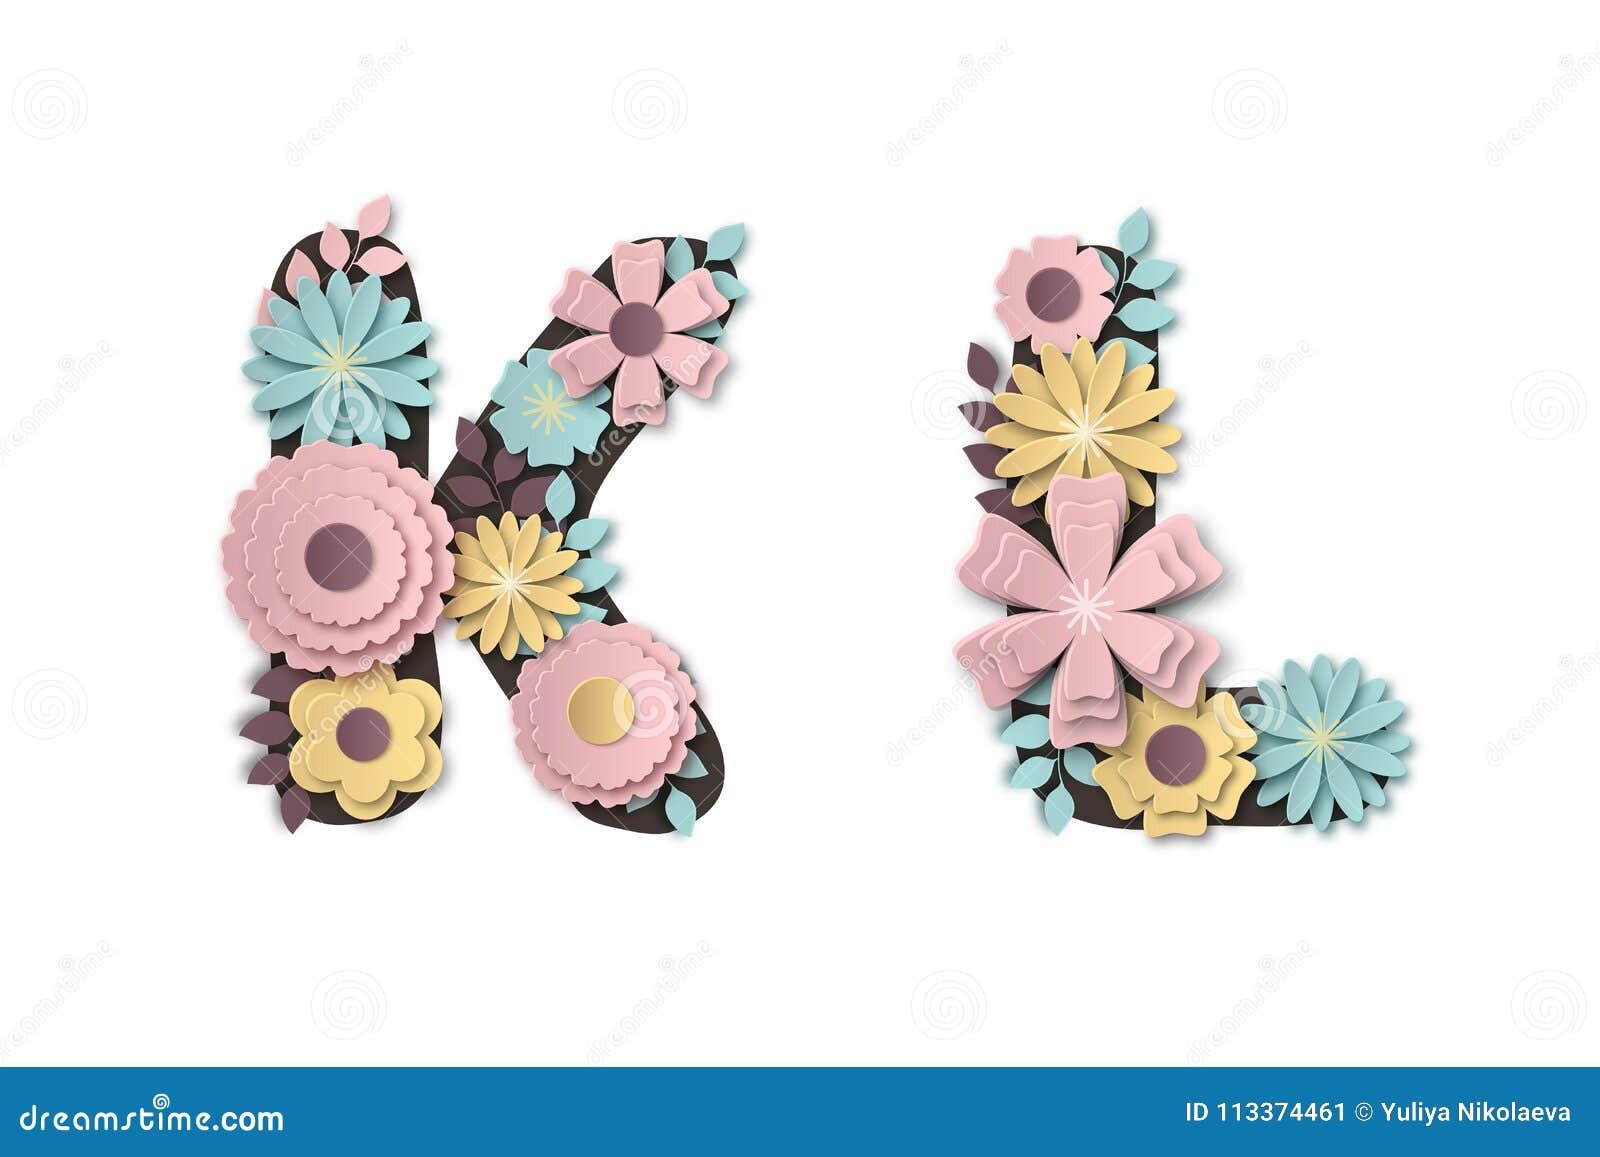 Paper Art Flower Alphabet Beautiful Romantic Gentle Letters In